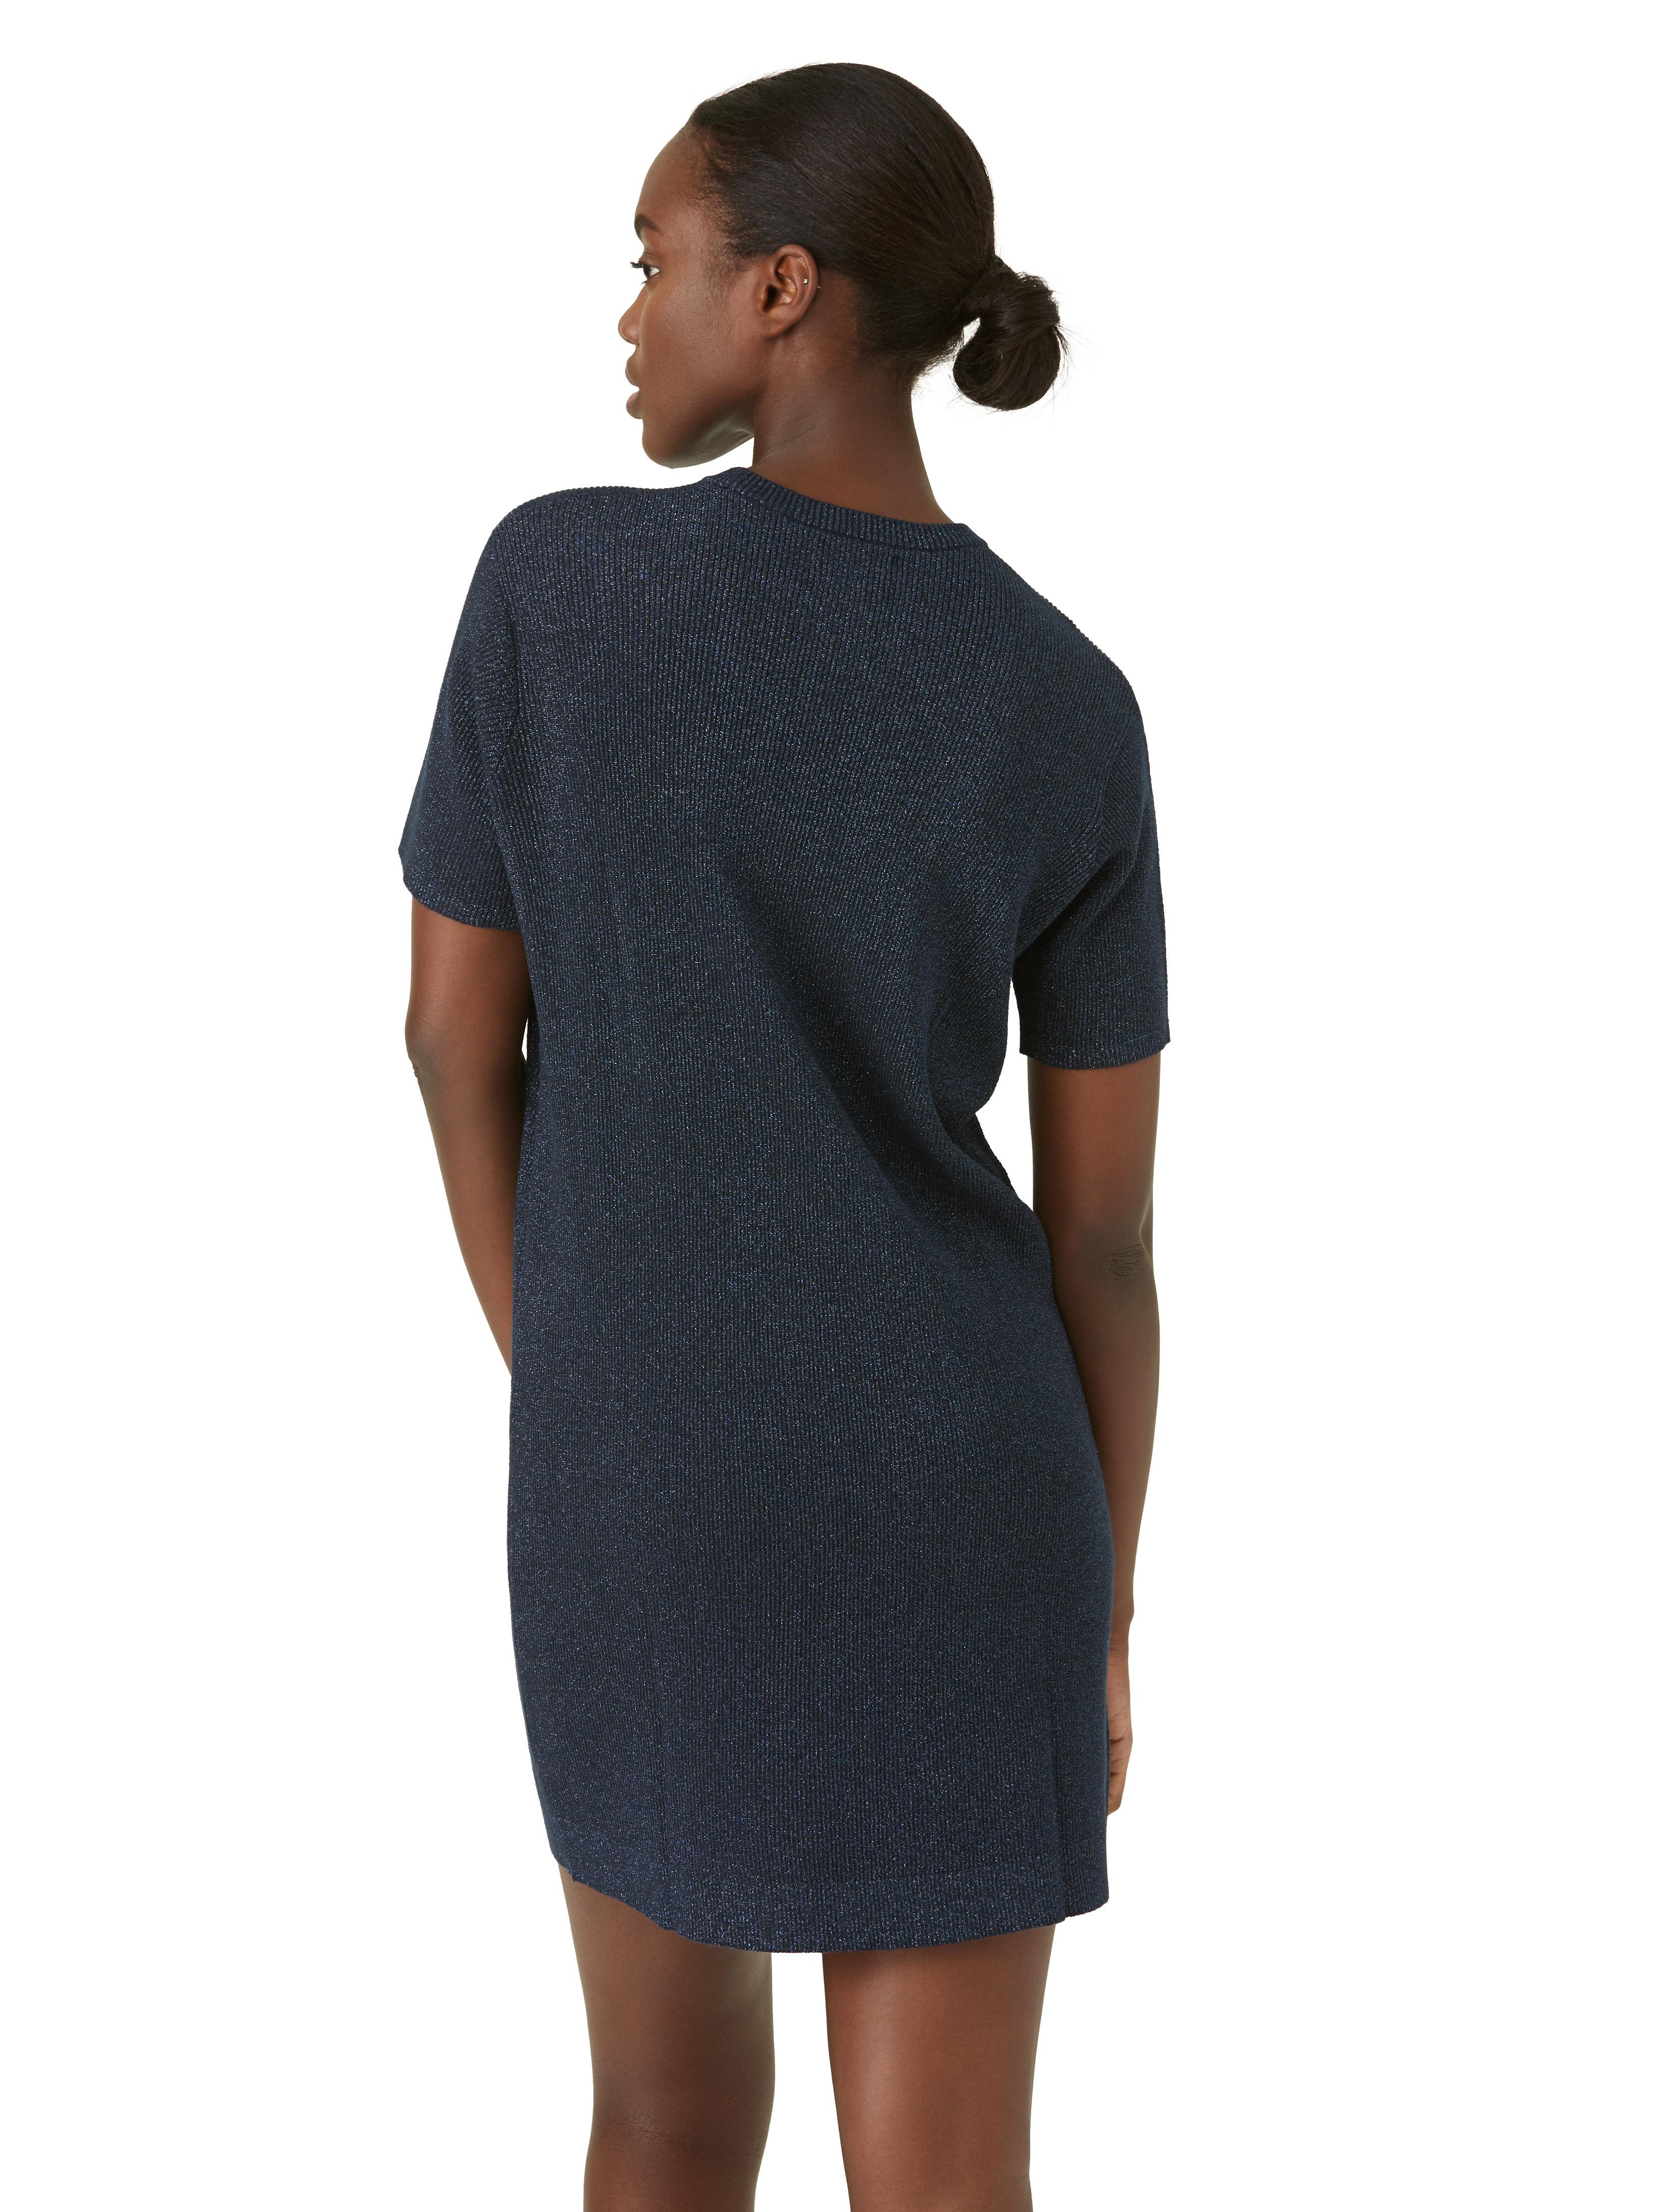 Lyst frank oak lurex shimmer t shirt dress in navy in blue for Frank and oak shirt